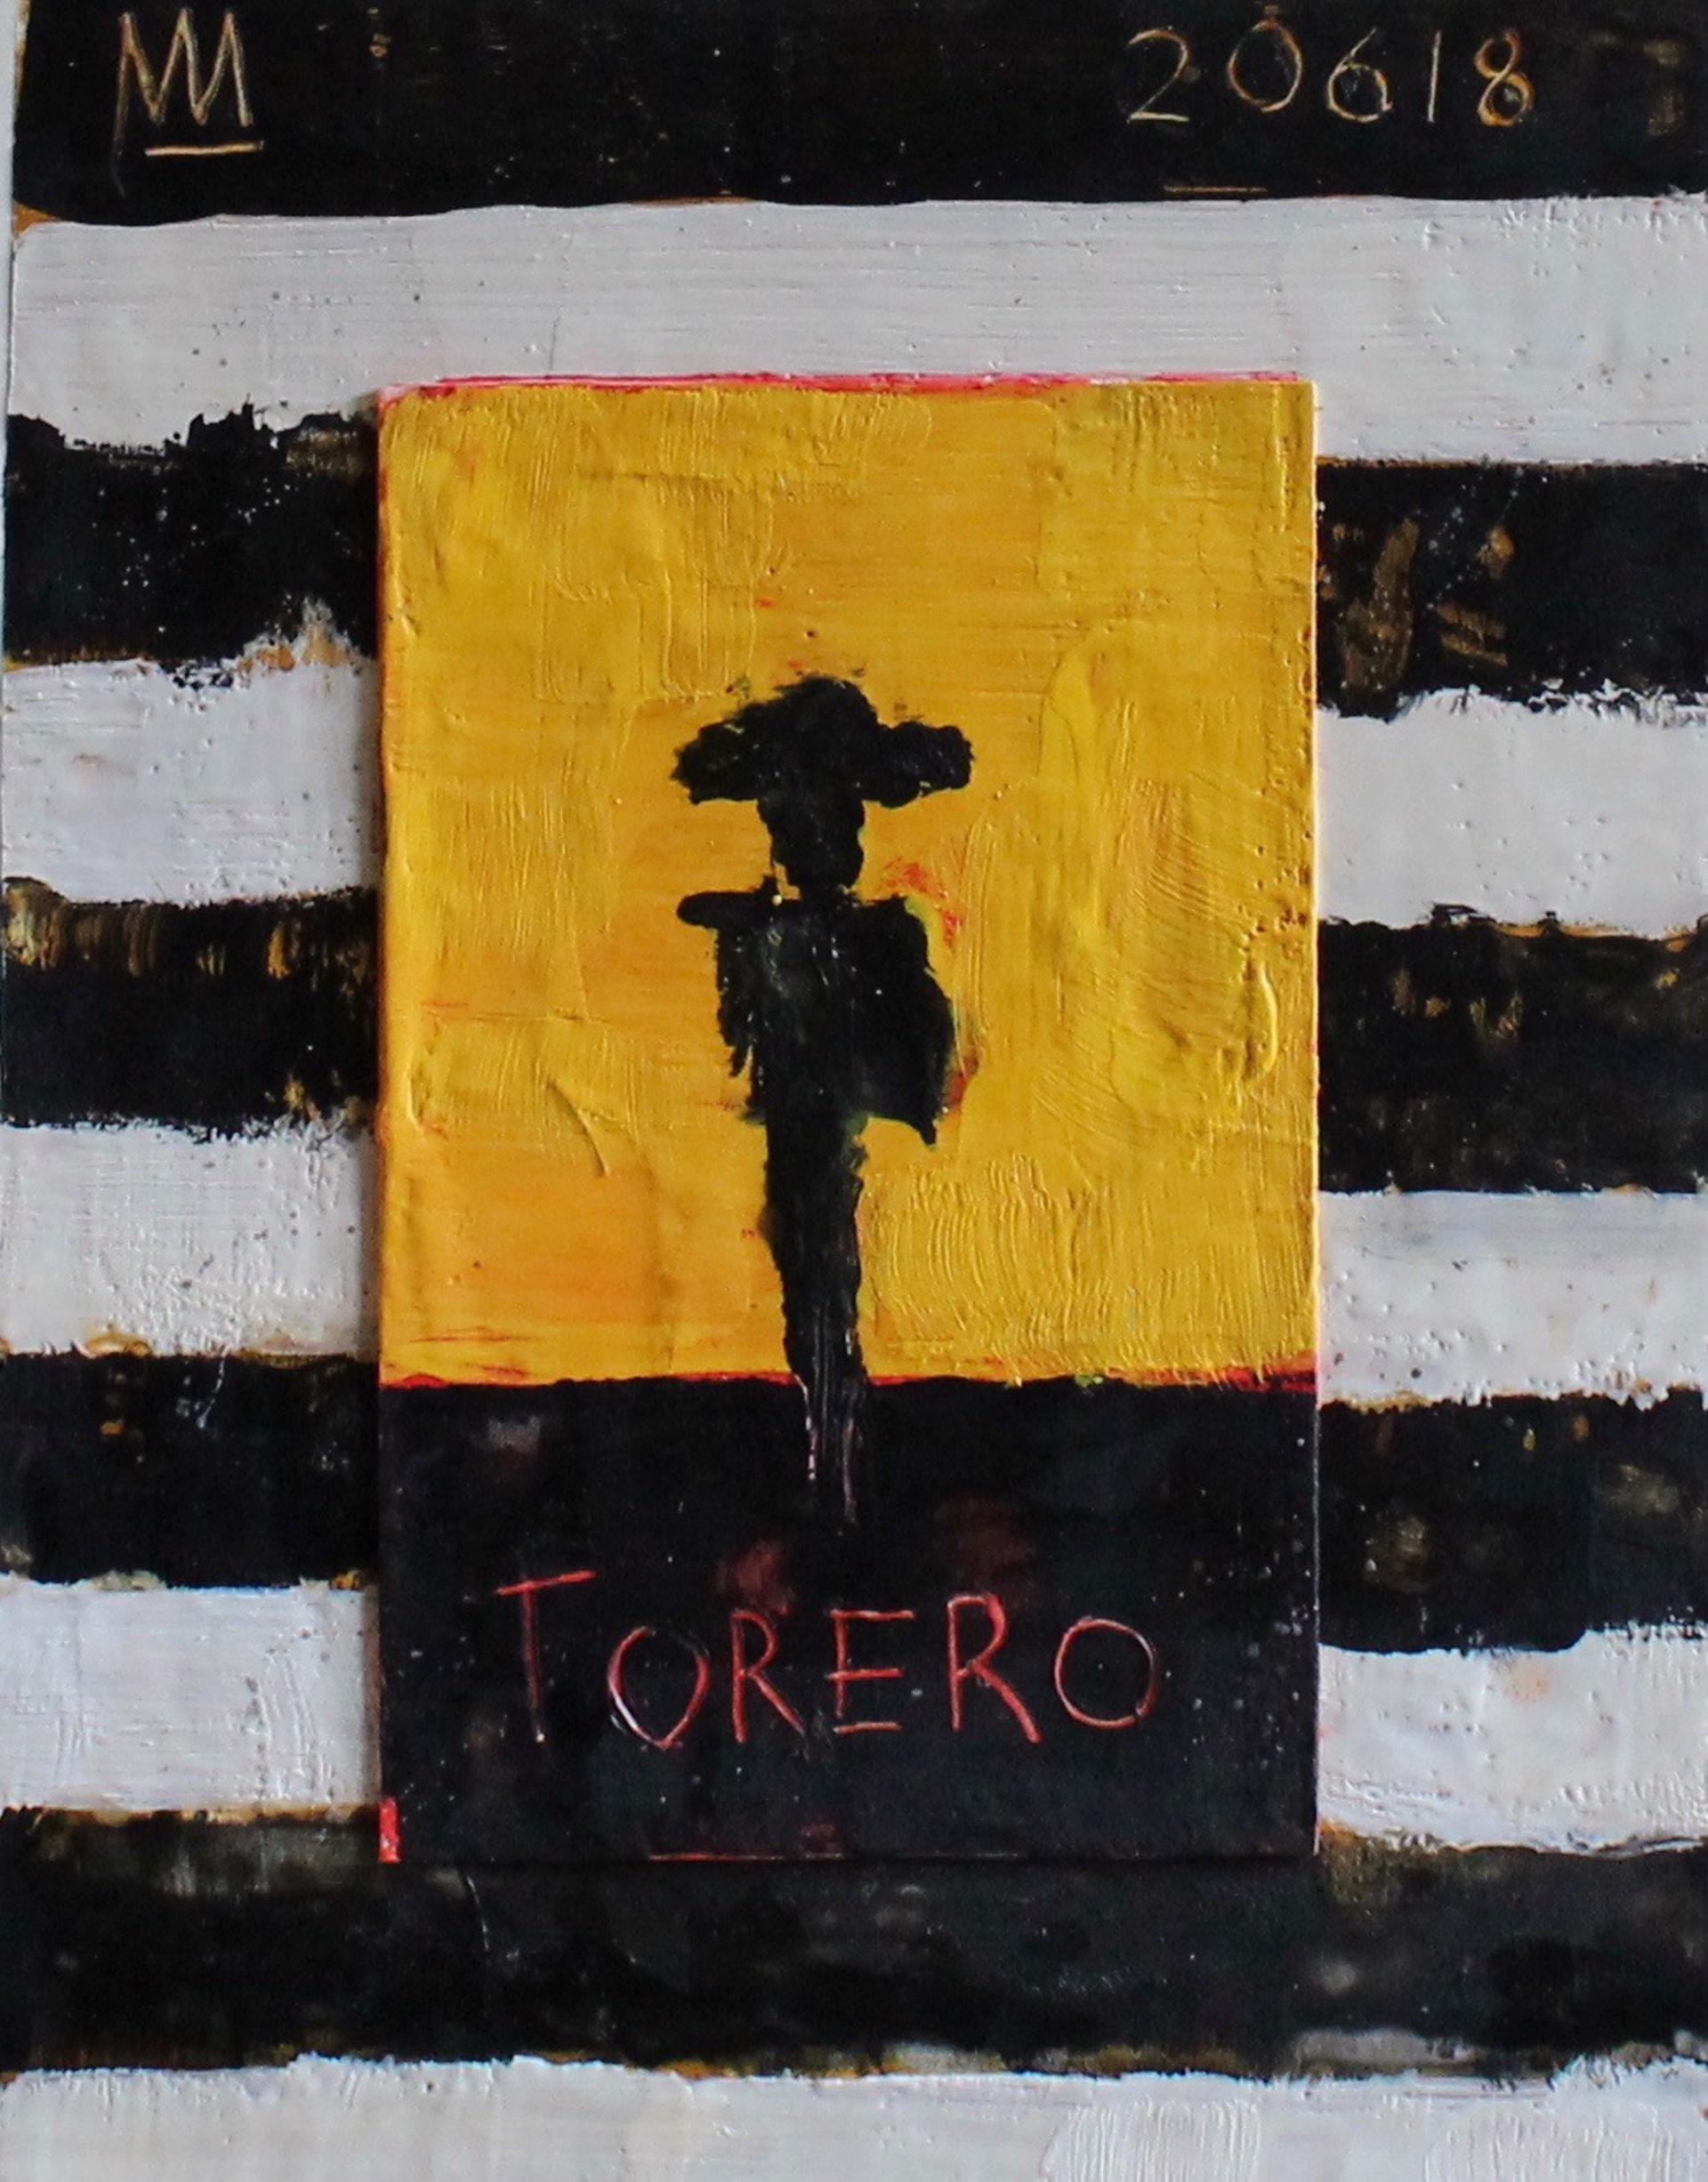 Torero by Michael Snodgrass